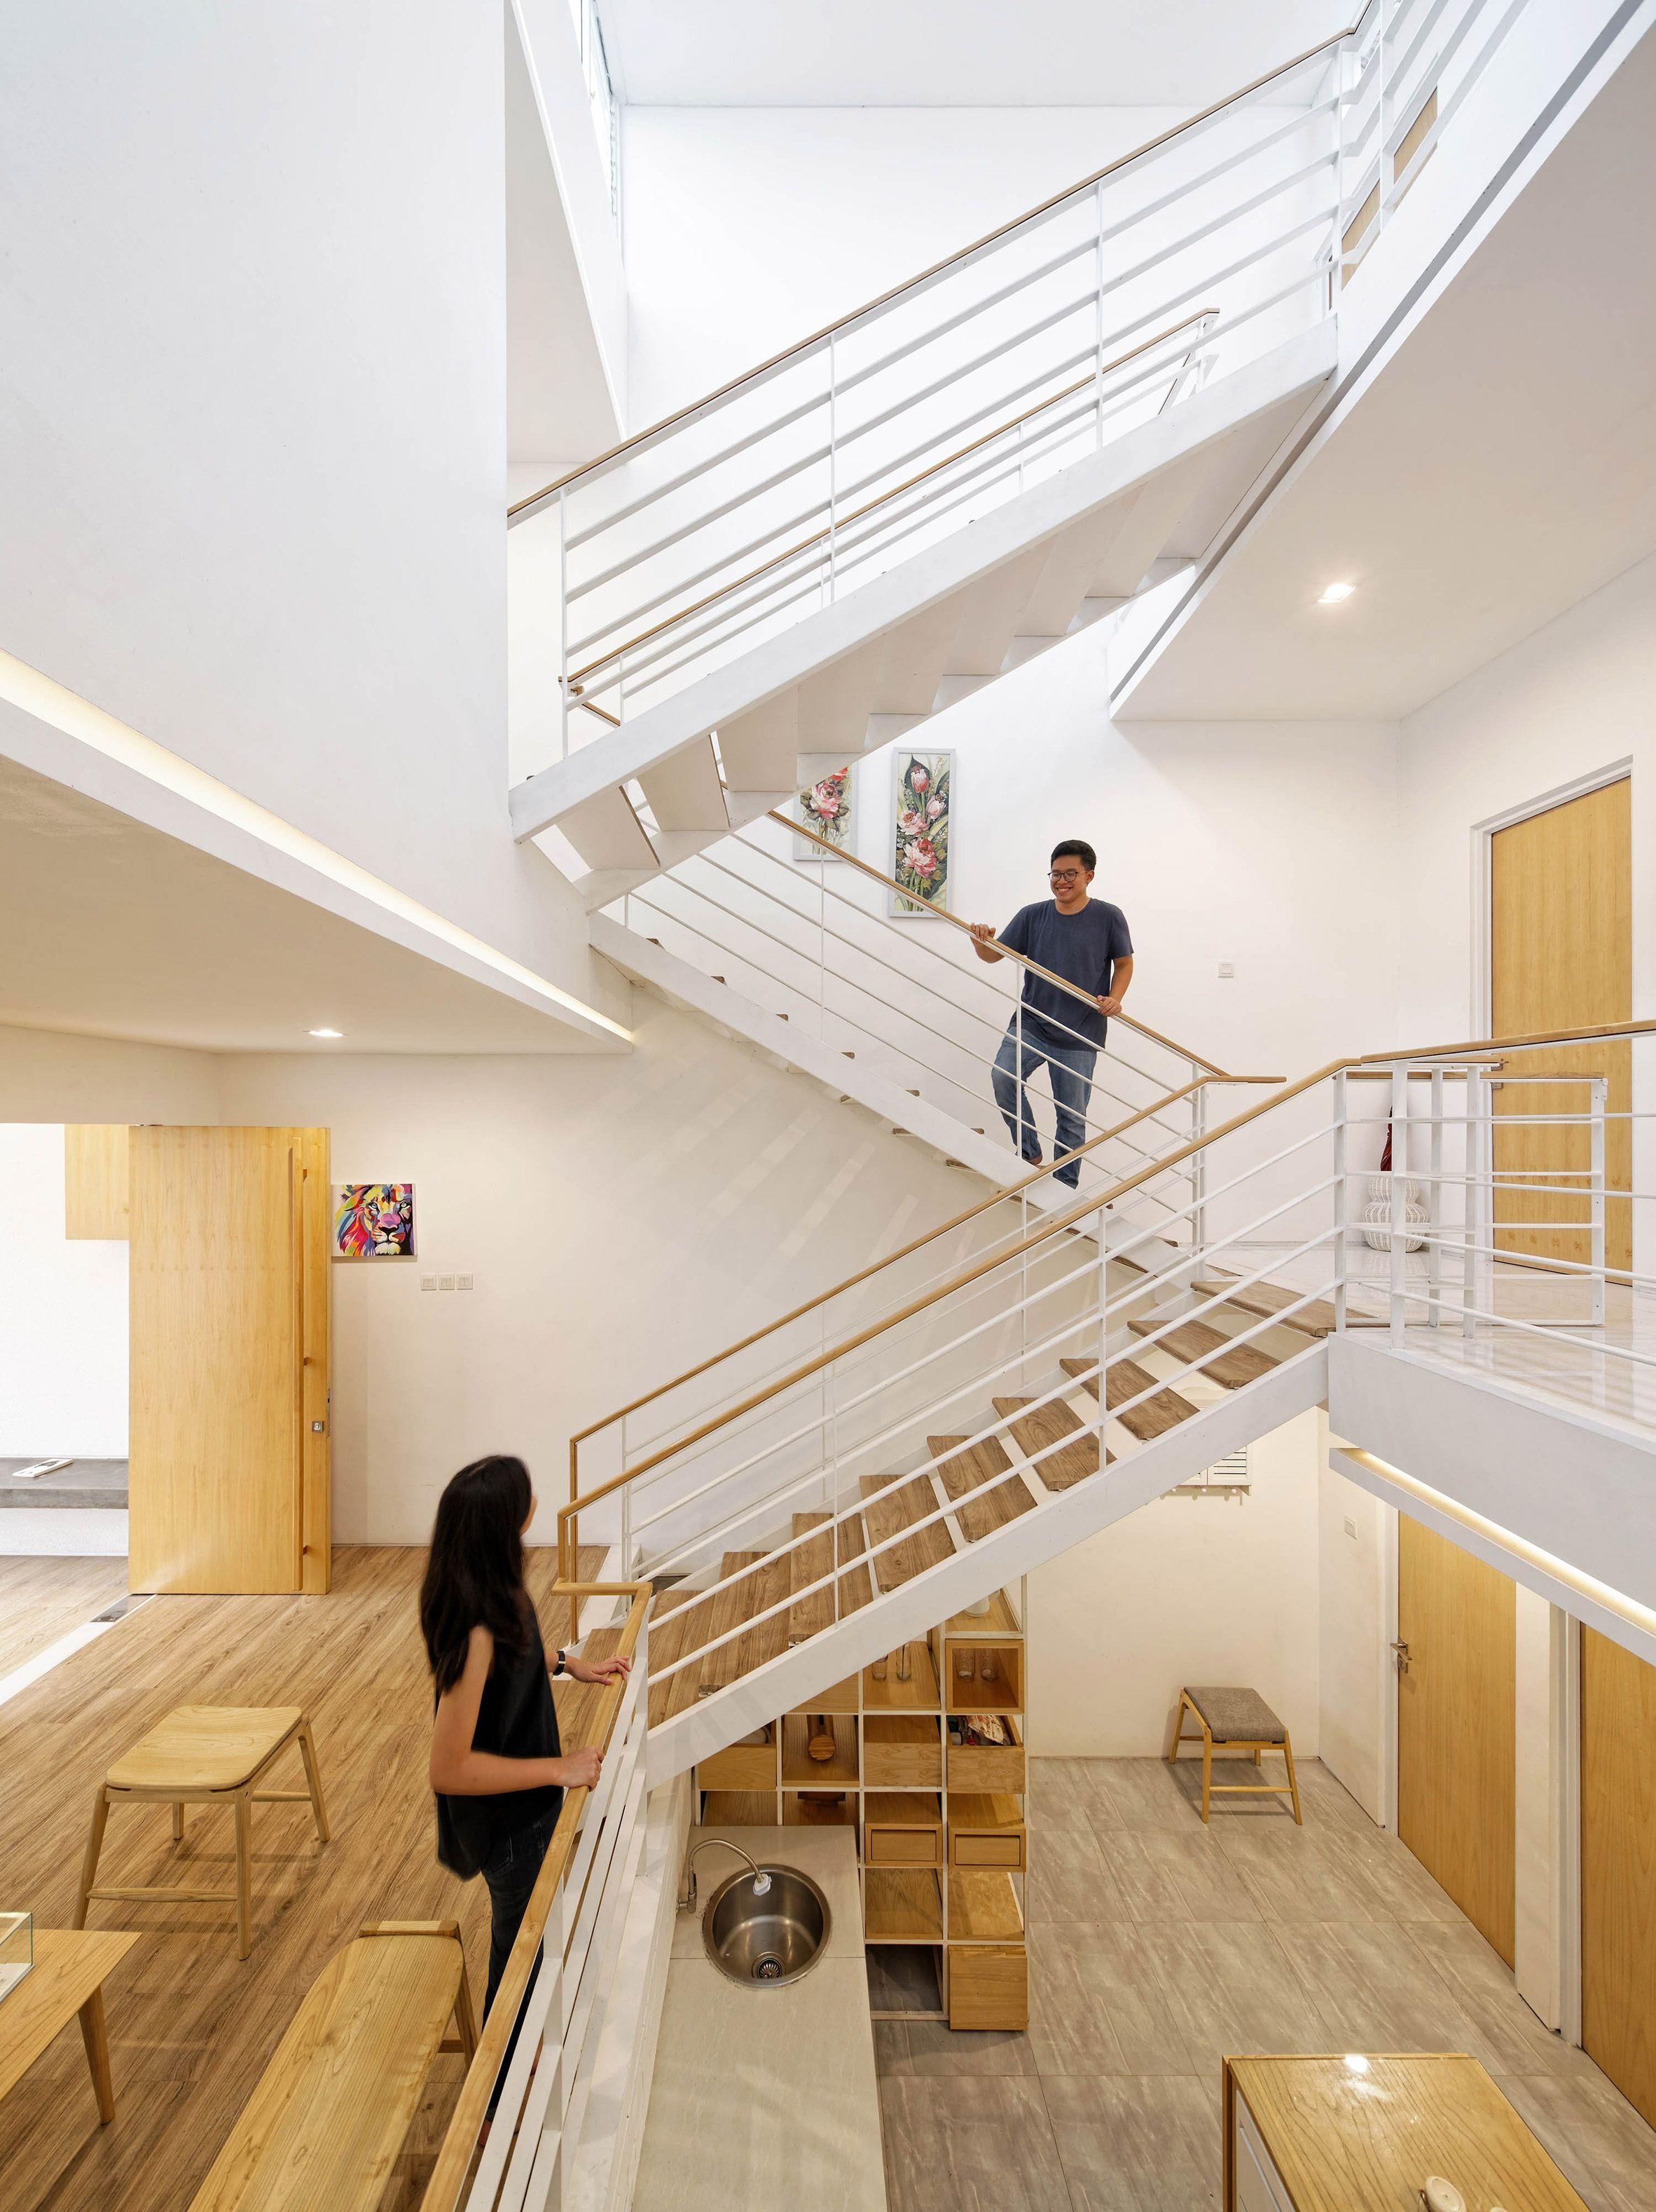 Splow House by Delution Architect | Urban Design | Pinterest